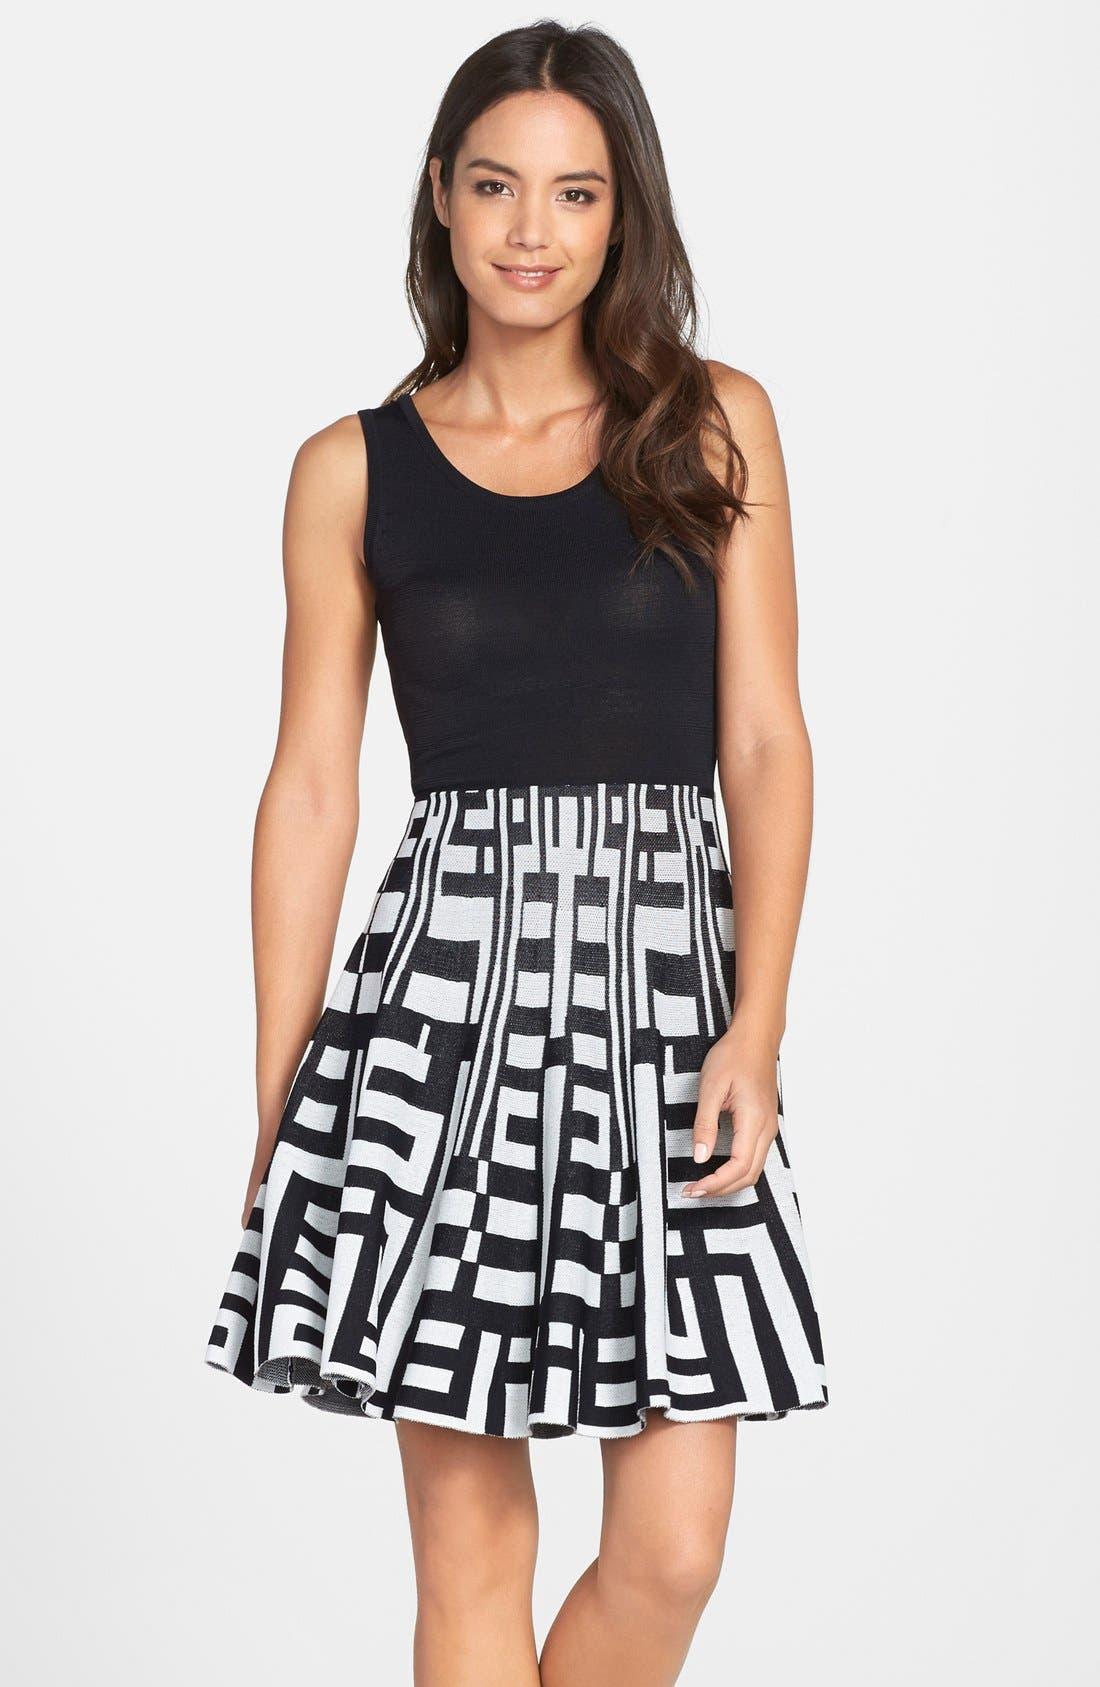 Main Image - Plenty by Tracy Reese 'Amber' Print Skirt Fit & Flare Sweater Dress (Regular & Petite)